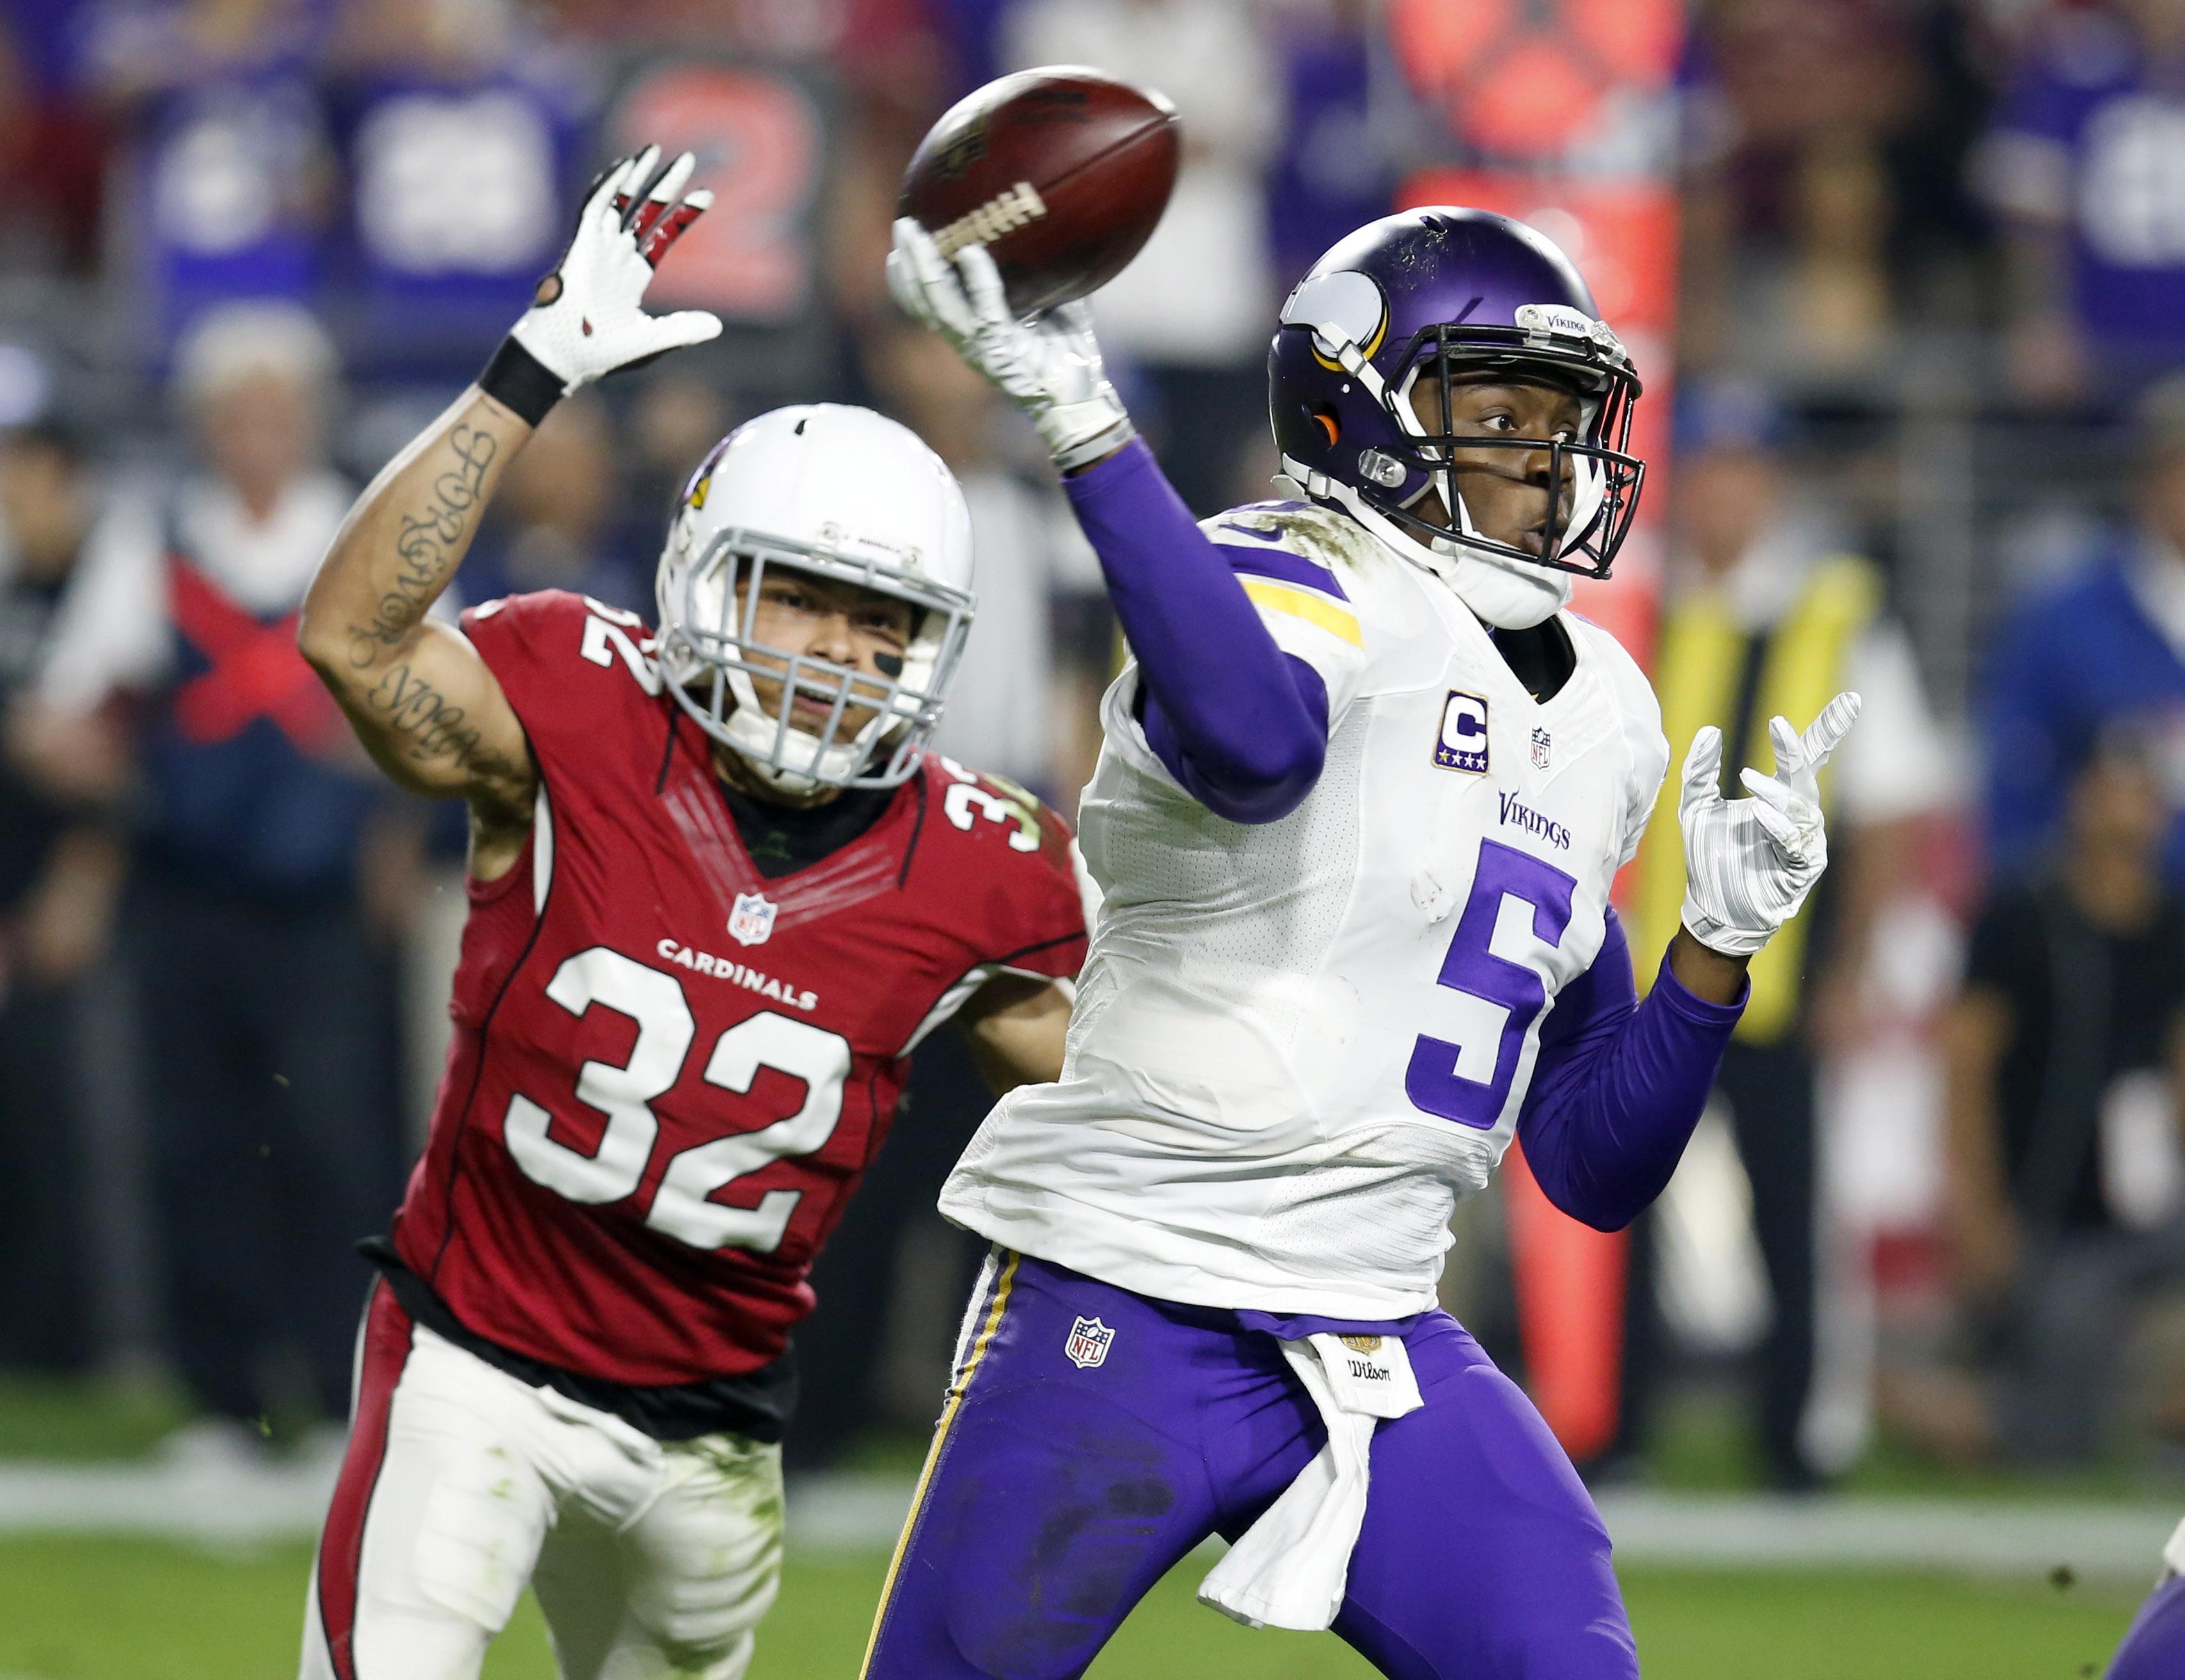 Minnesota Vikings quarterback Teddy Bridgewater (5) throws under pressure from Arizona Cardinals free safety Tyrann Mathieu (32) during the second half of an NFL football game, Thursday, Dec. 10, 2015, in Glendale, Ariz. (AP Photo/Rick Scuteri)